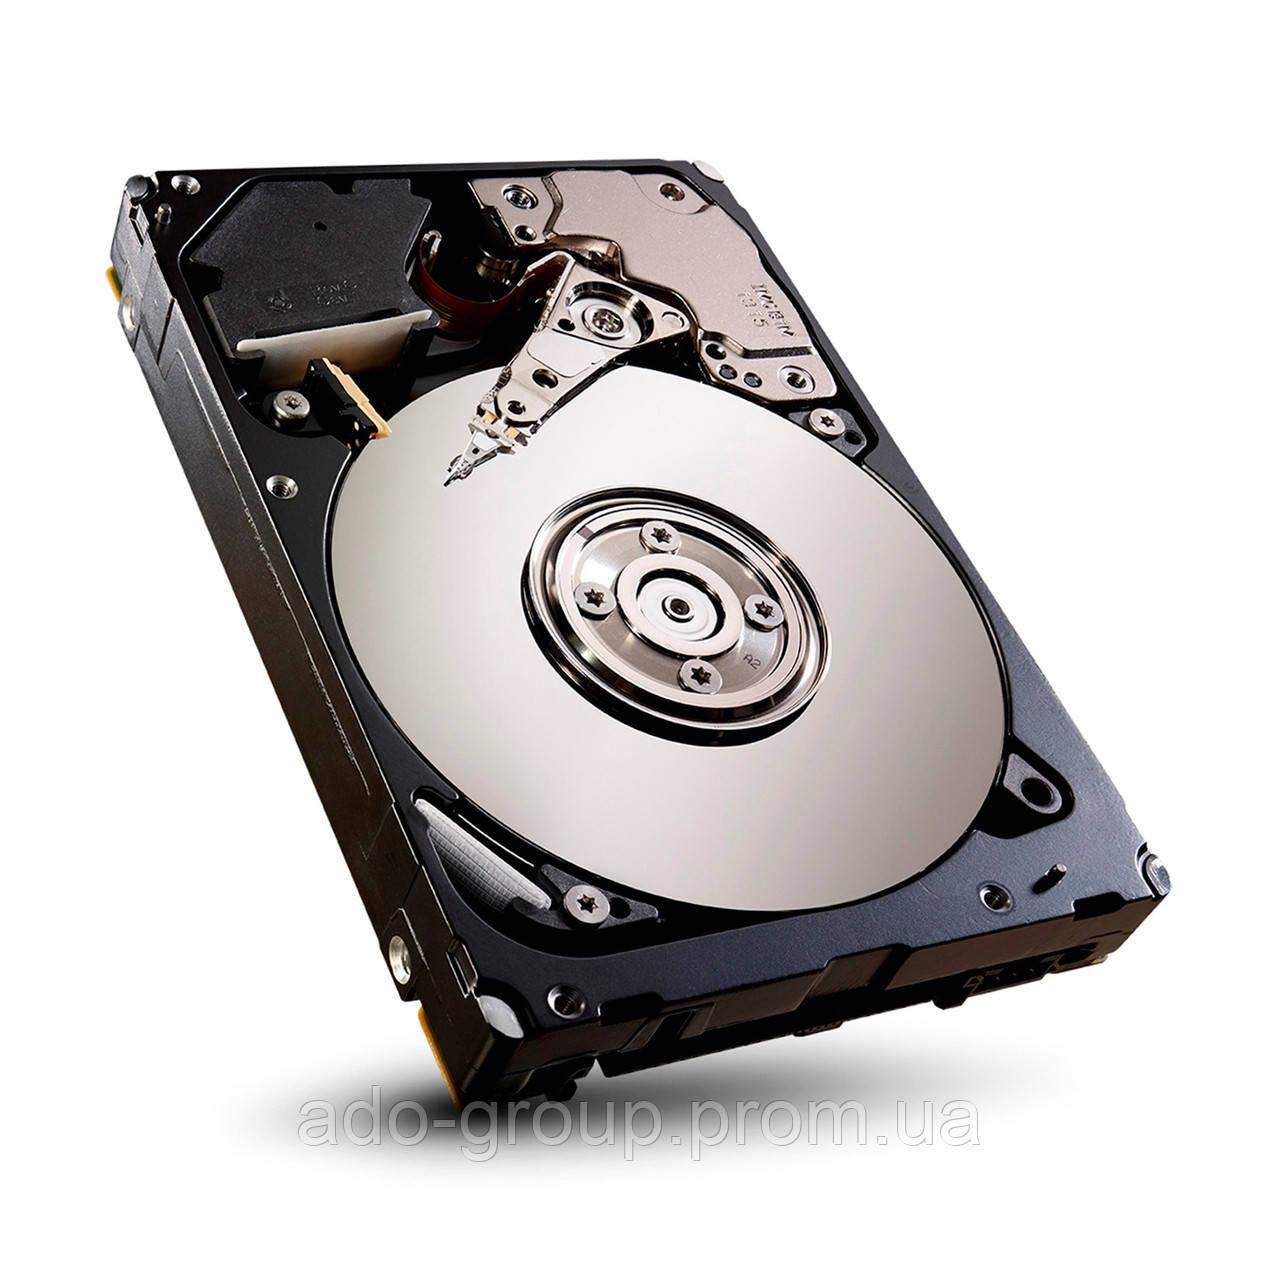 "765455-S21 Жесткий диск HP 2000GB SATA 7.2K  2.5"" +"